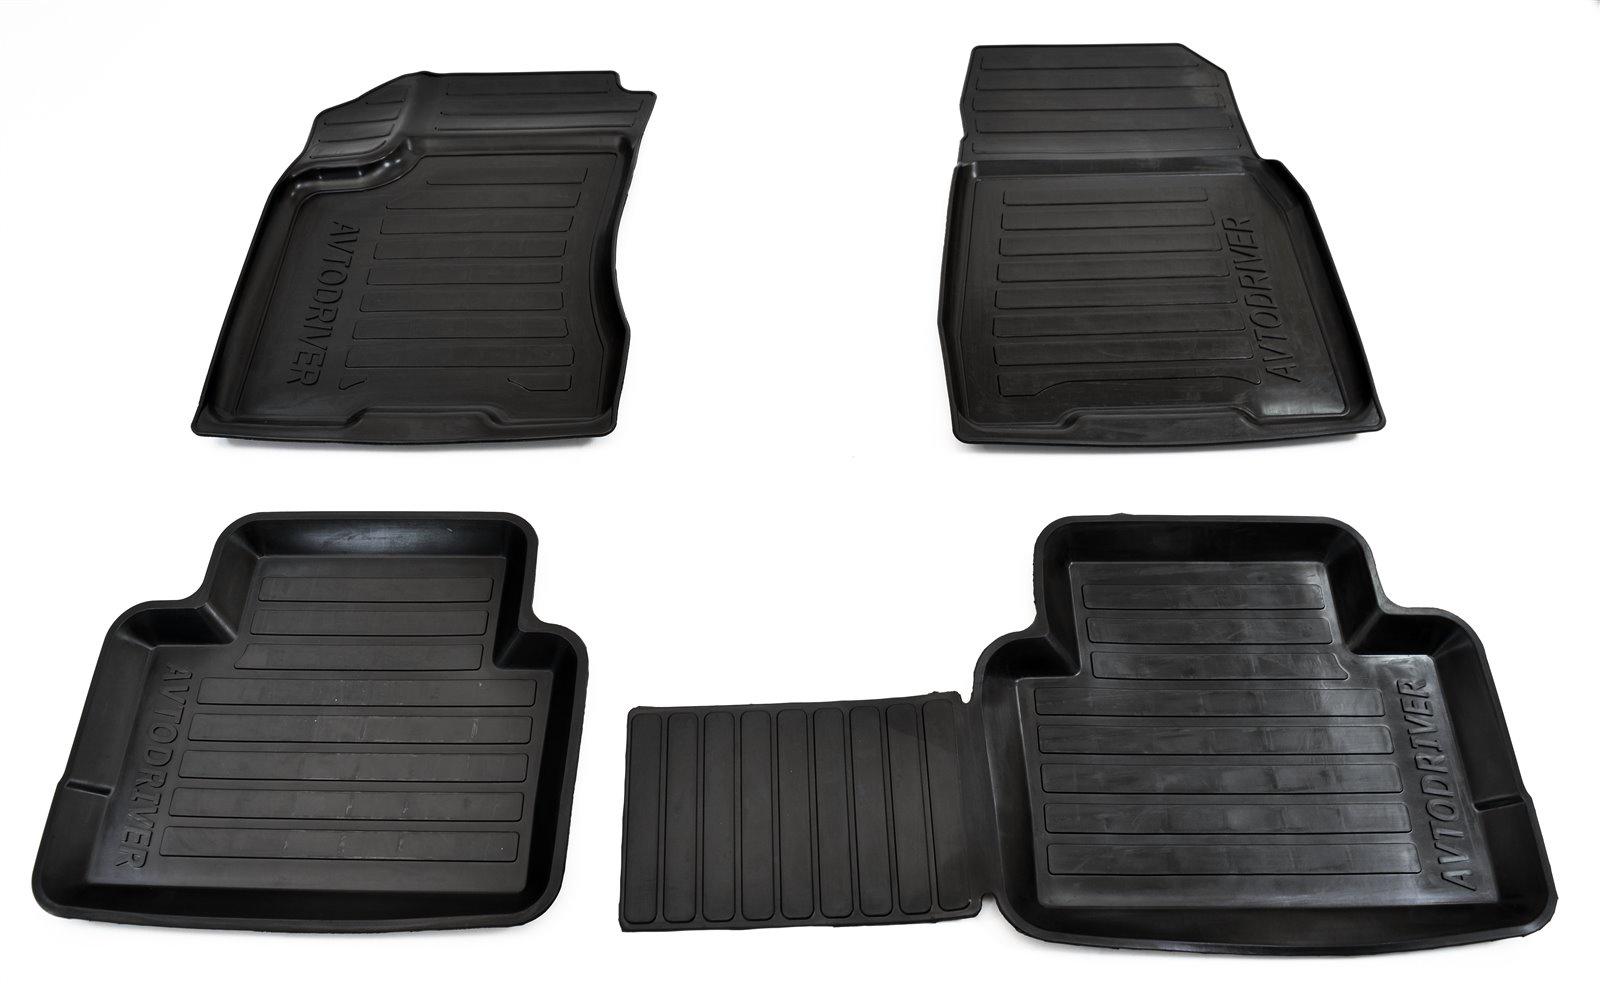 Коврики салона Avtodriver для Nissan X-Trail (2014-) ADRJET043, резиновые, с бортиком, черный for nissan x trail t32 2015 2019 car trunk mat element carnis00056